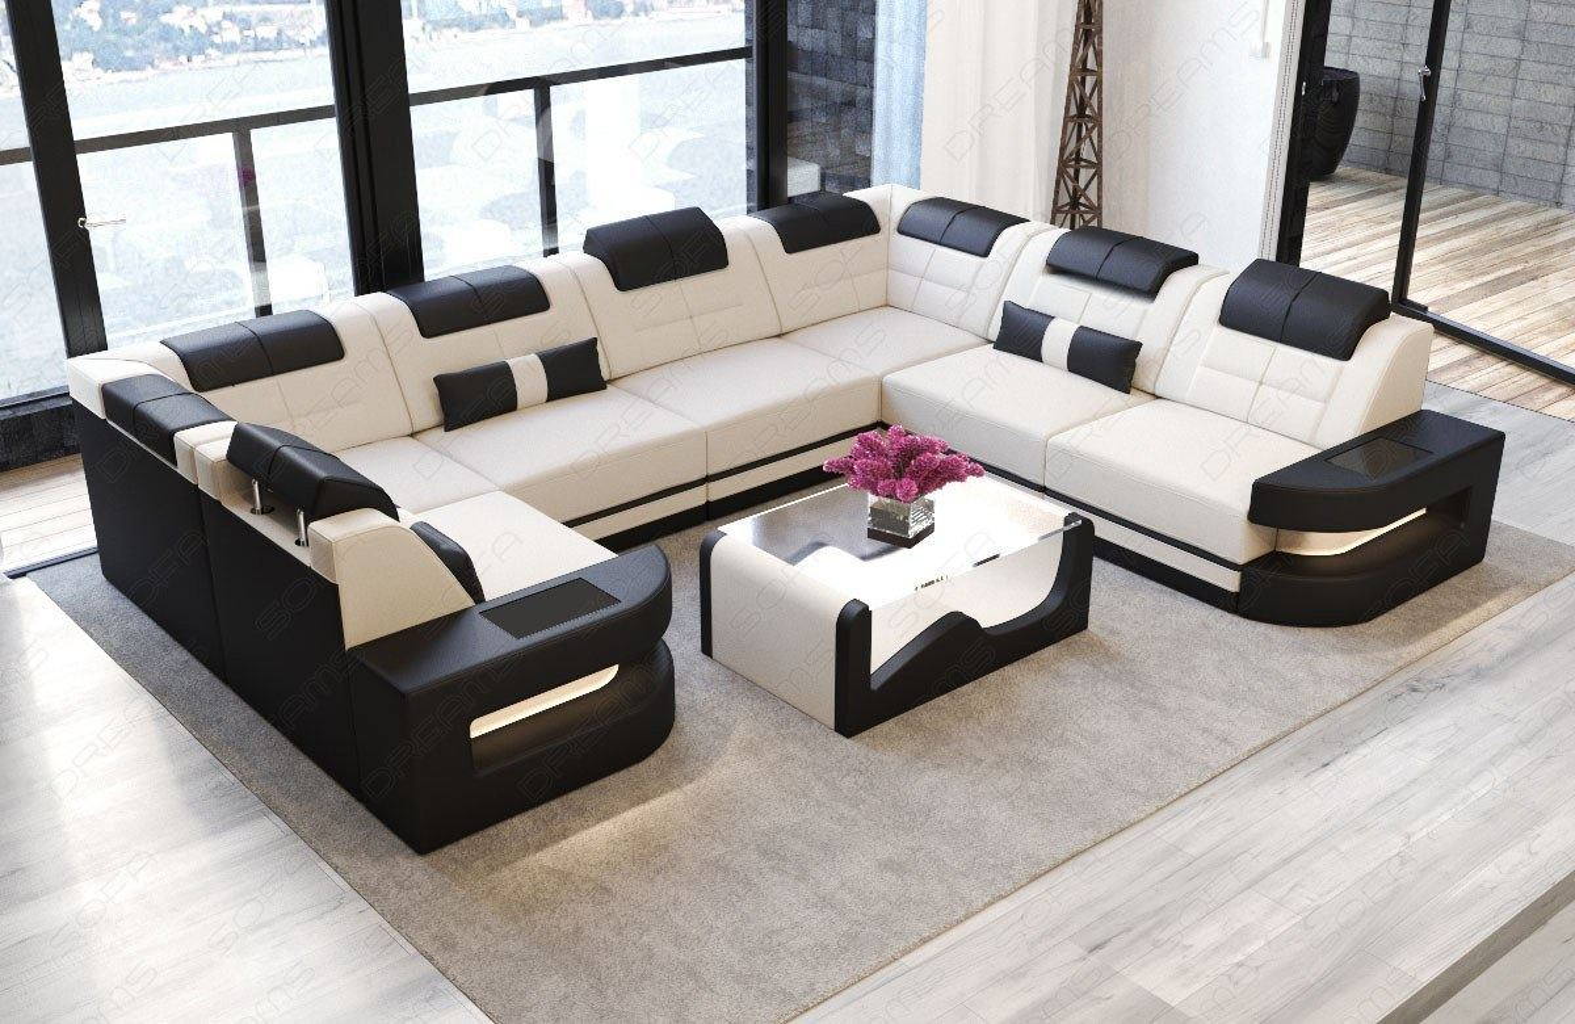 designer relax luxus couch ecksofa wohnlandschaft como u led beleuchtung creme ebay. Black Bedroom Furniture Sets. Home Design Ideas